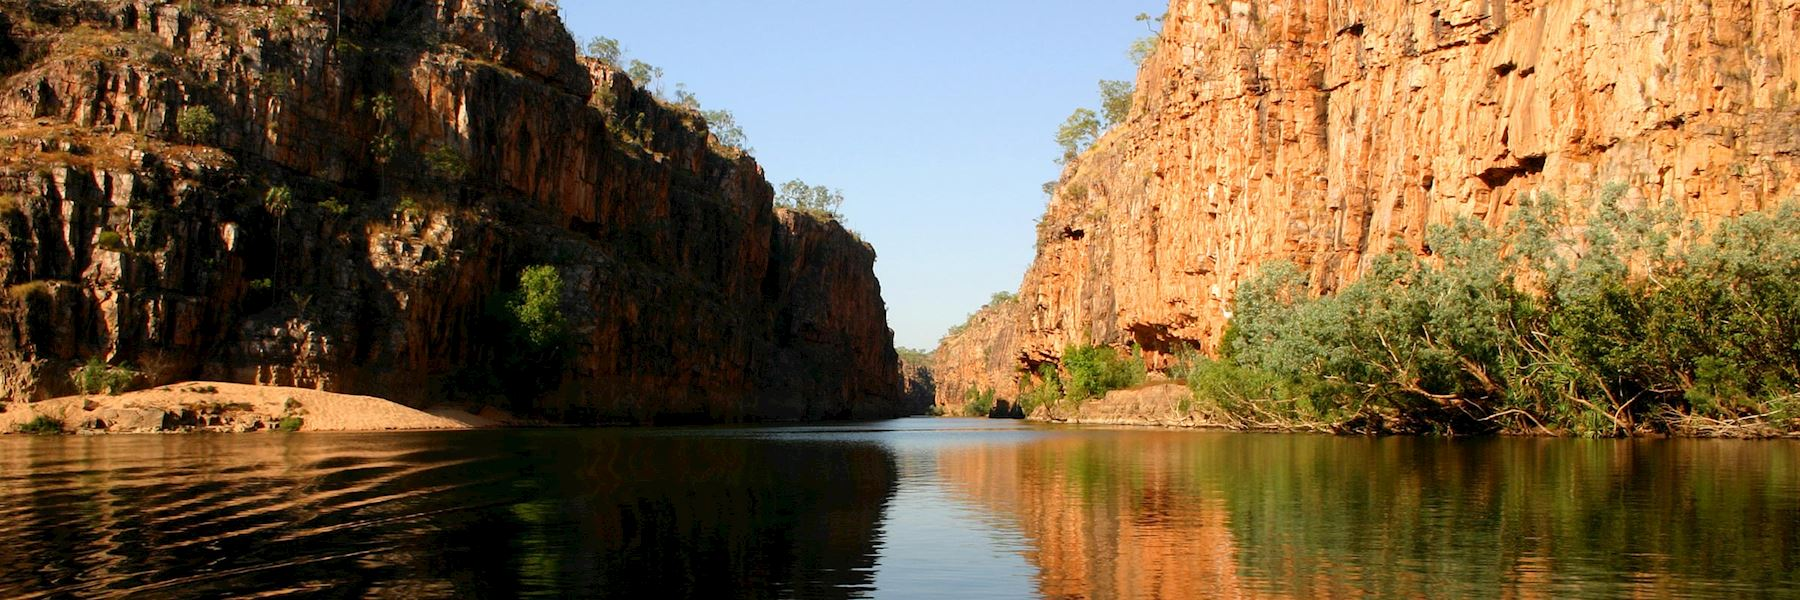 Visit Nitmiluk National Park, Australia